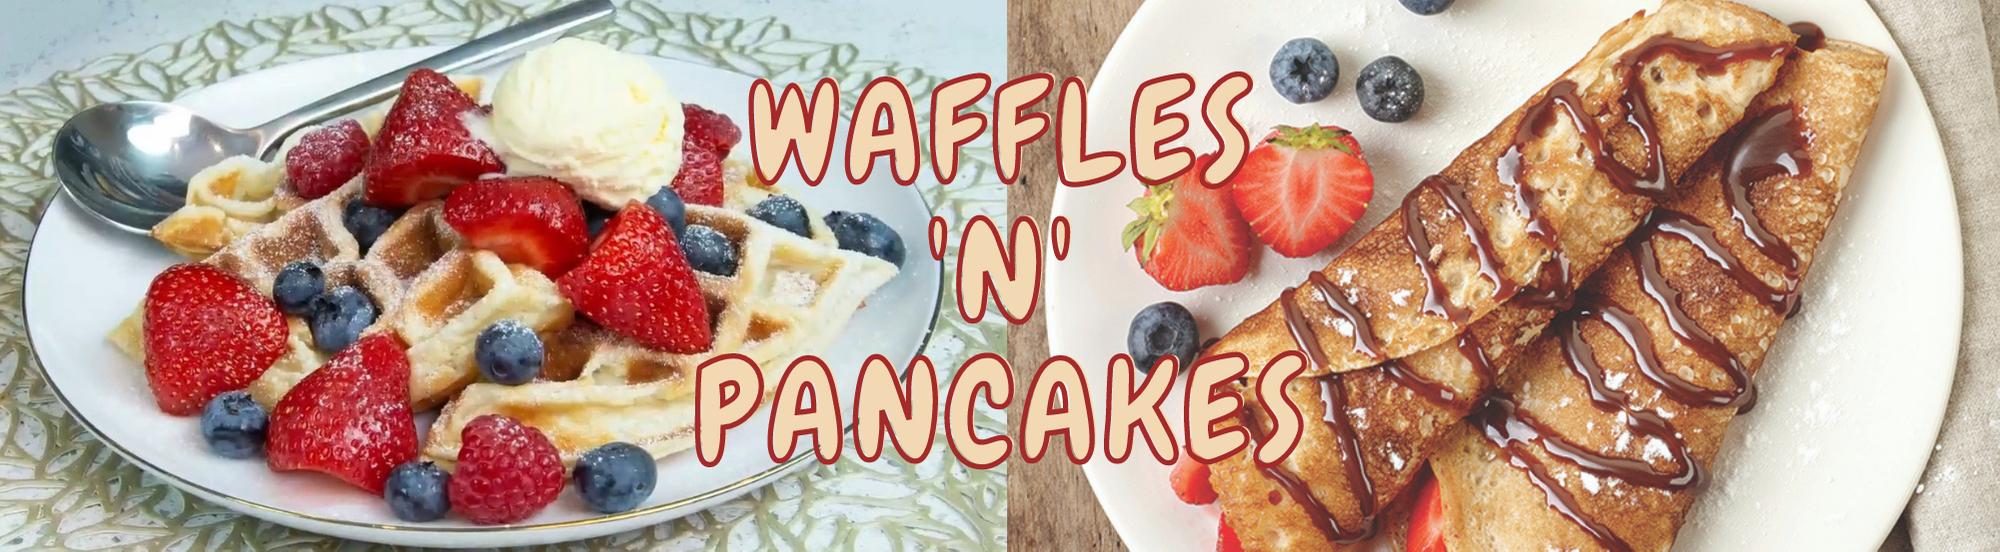 Waffles 'n' Pancakes